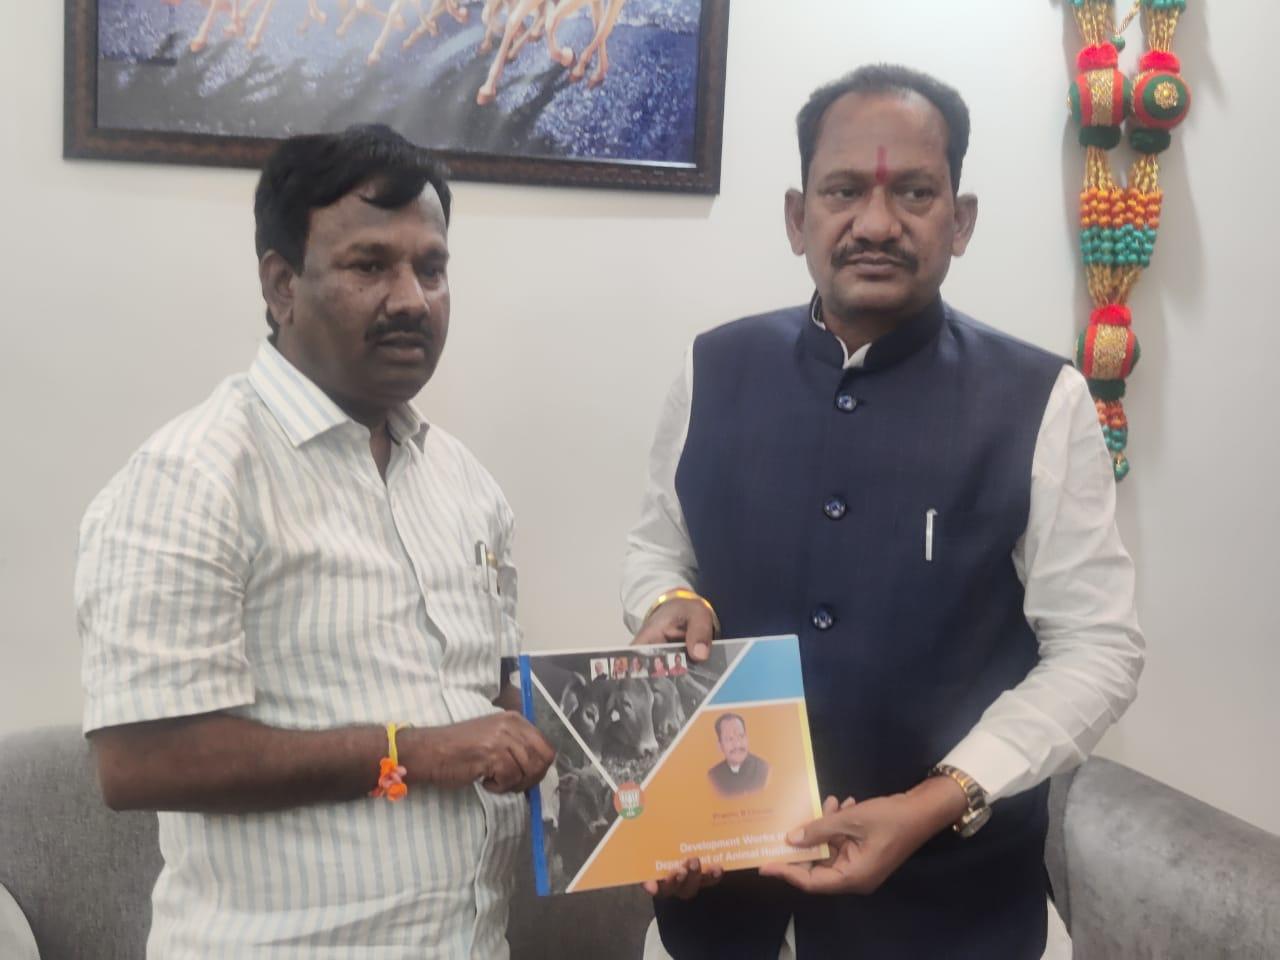 Prabhu Chavan meets Union Minister A Narayanswami